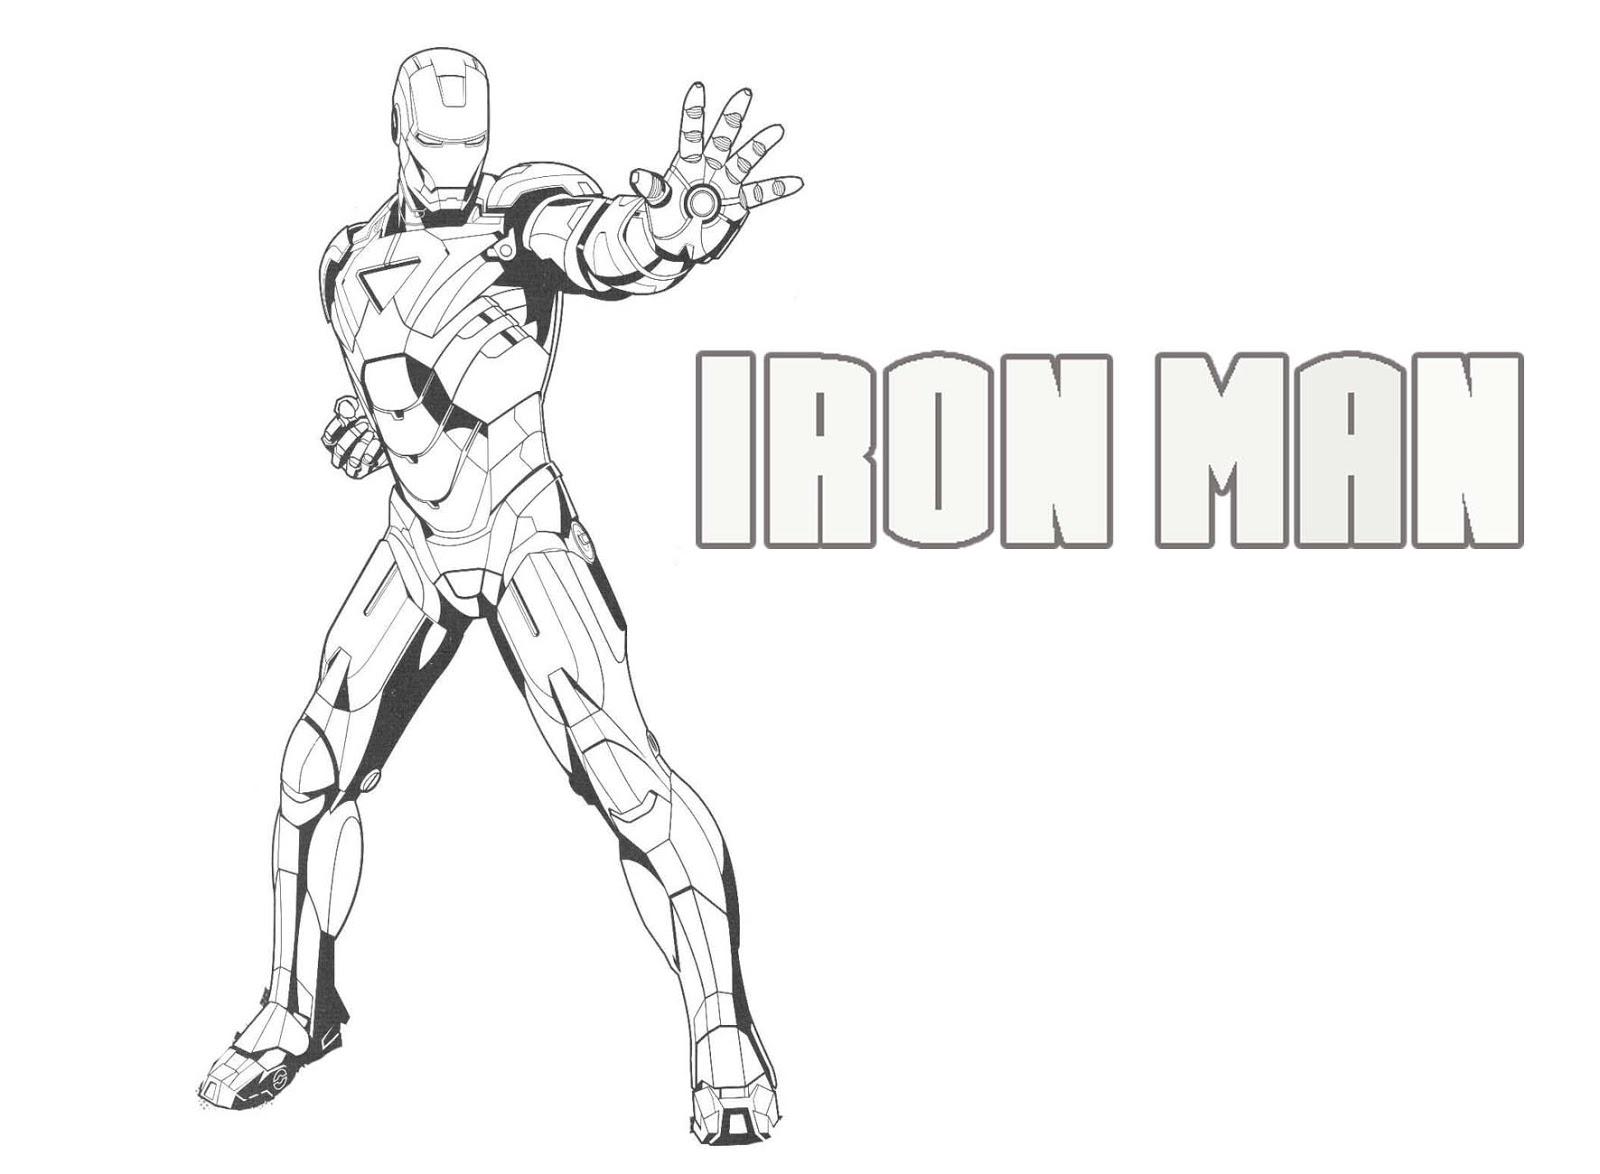 Kumpulan Sketsa Gambar Ironman